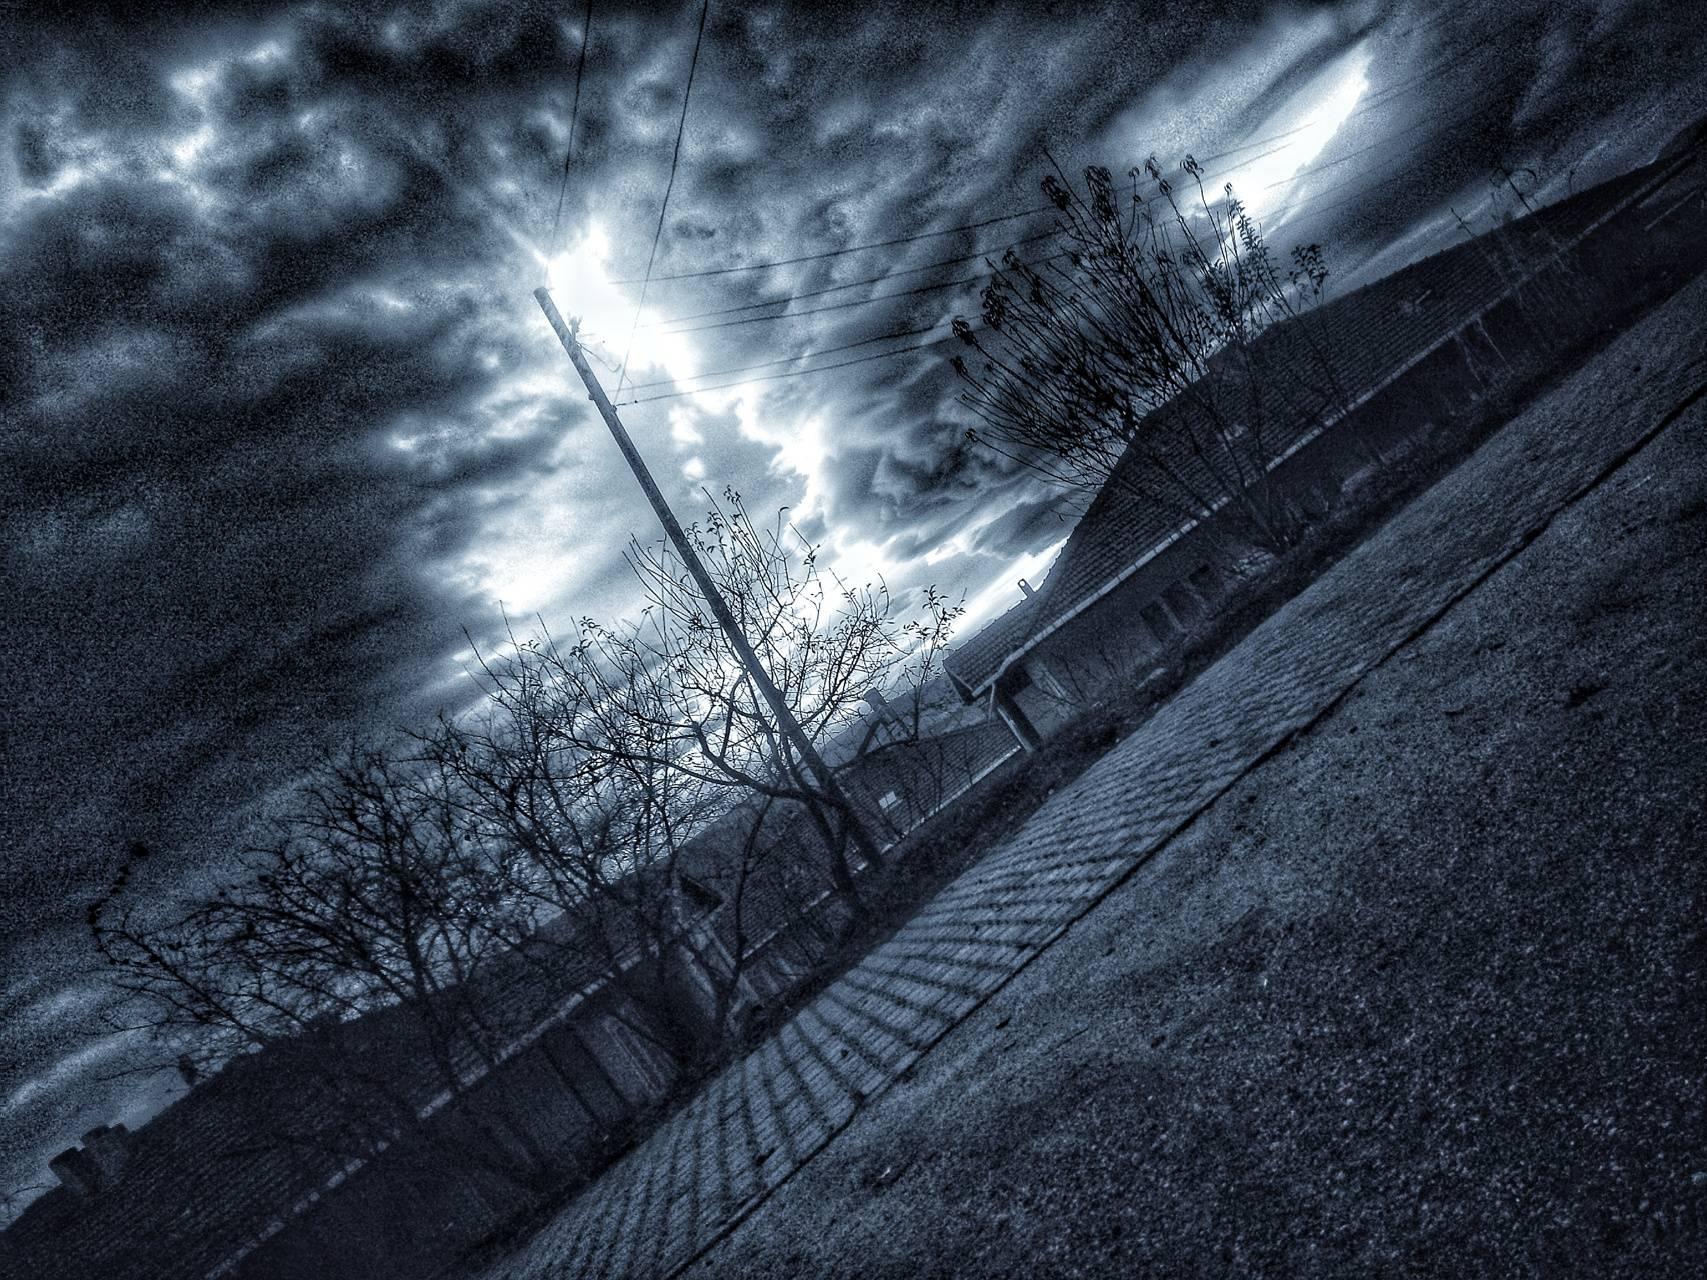 Siyah geceler